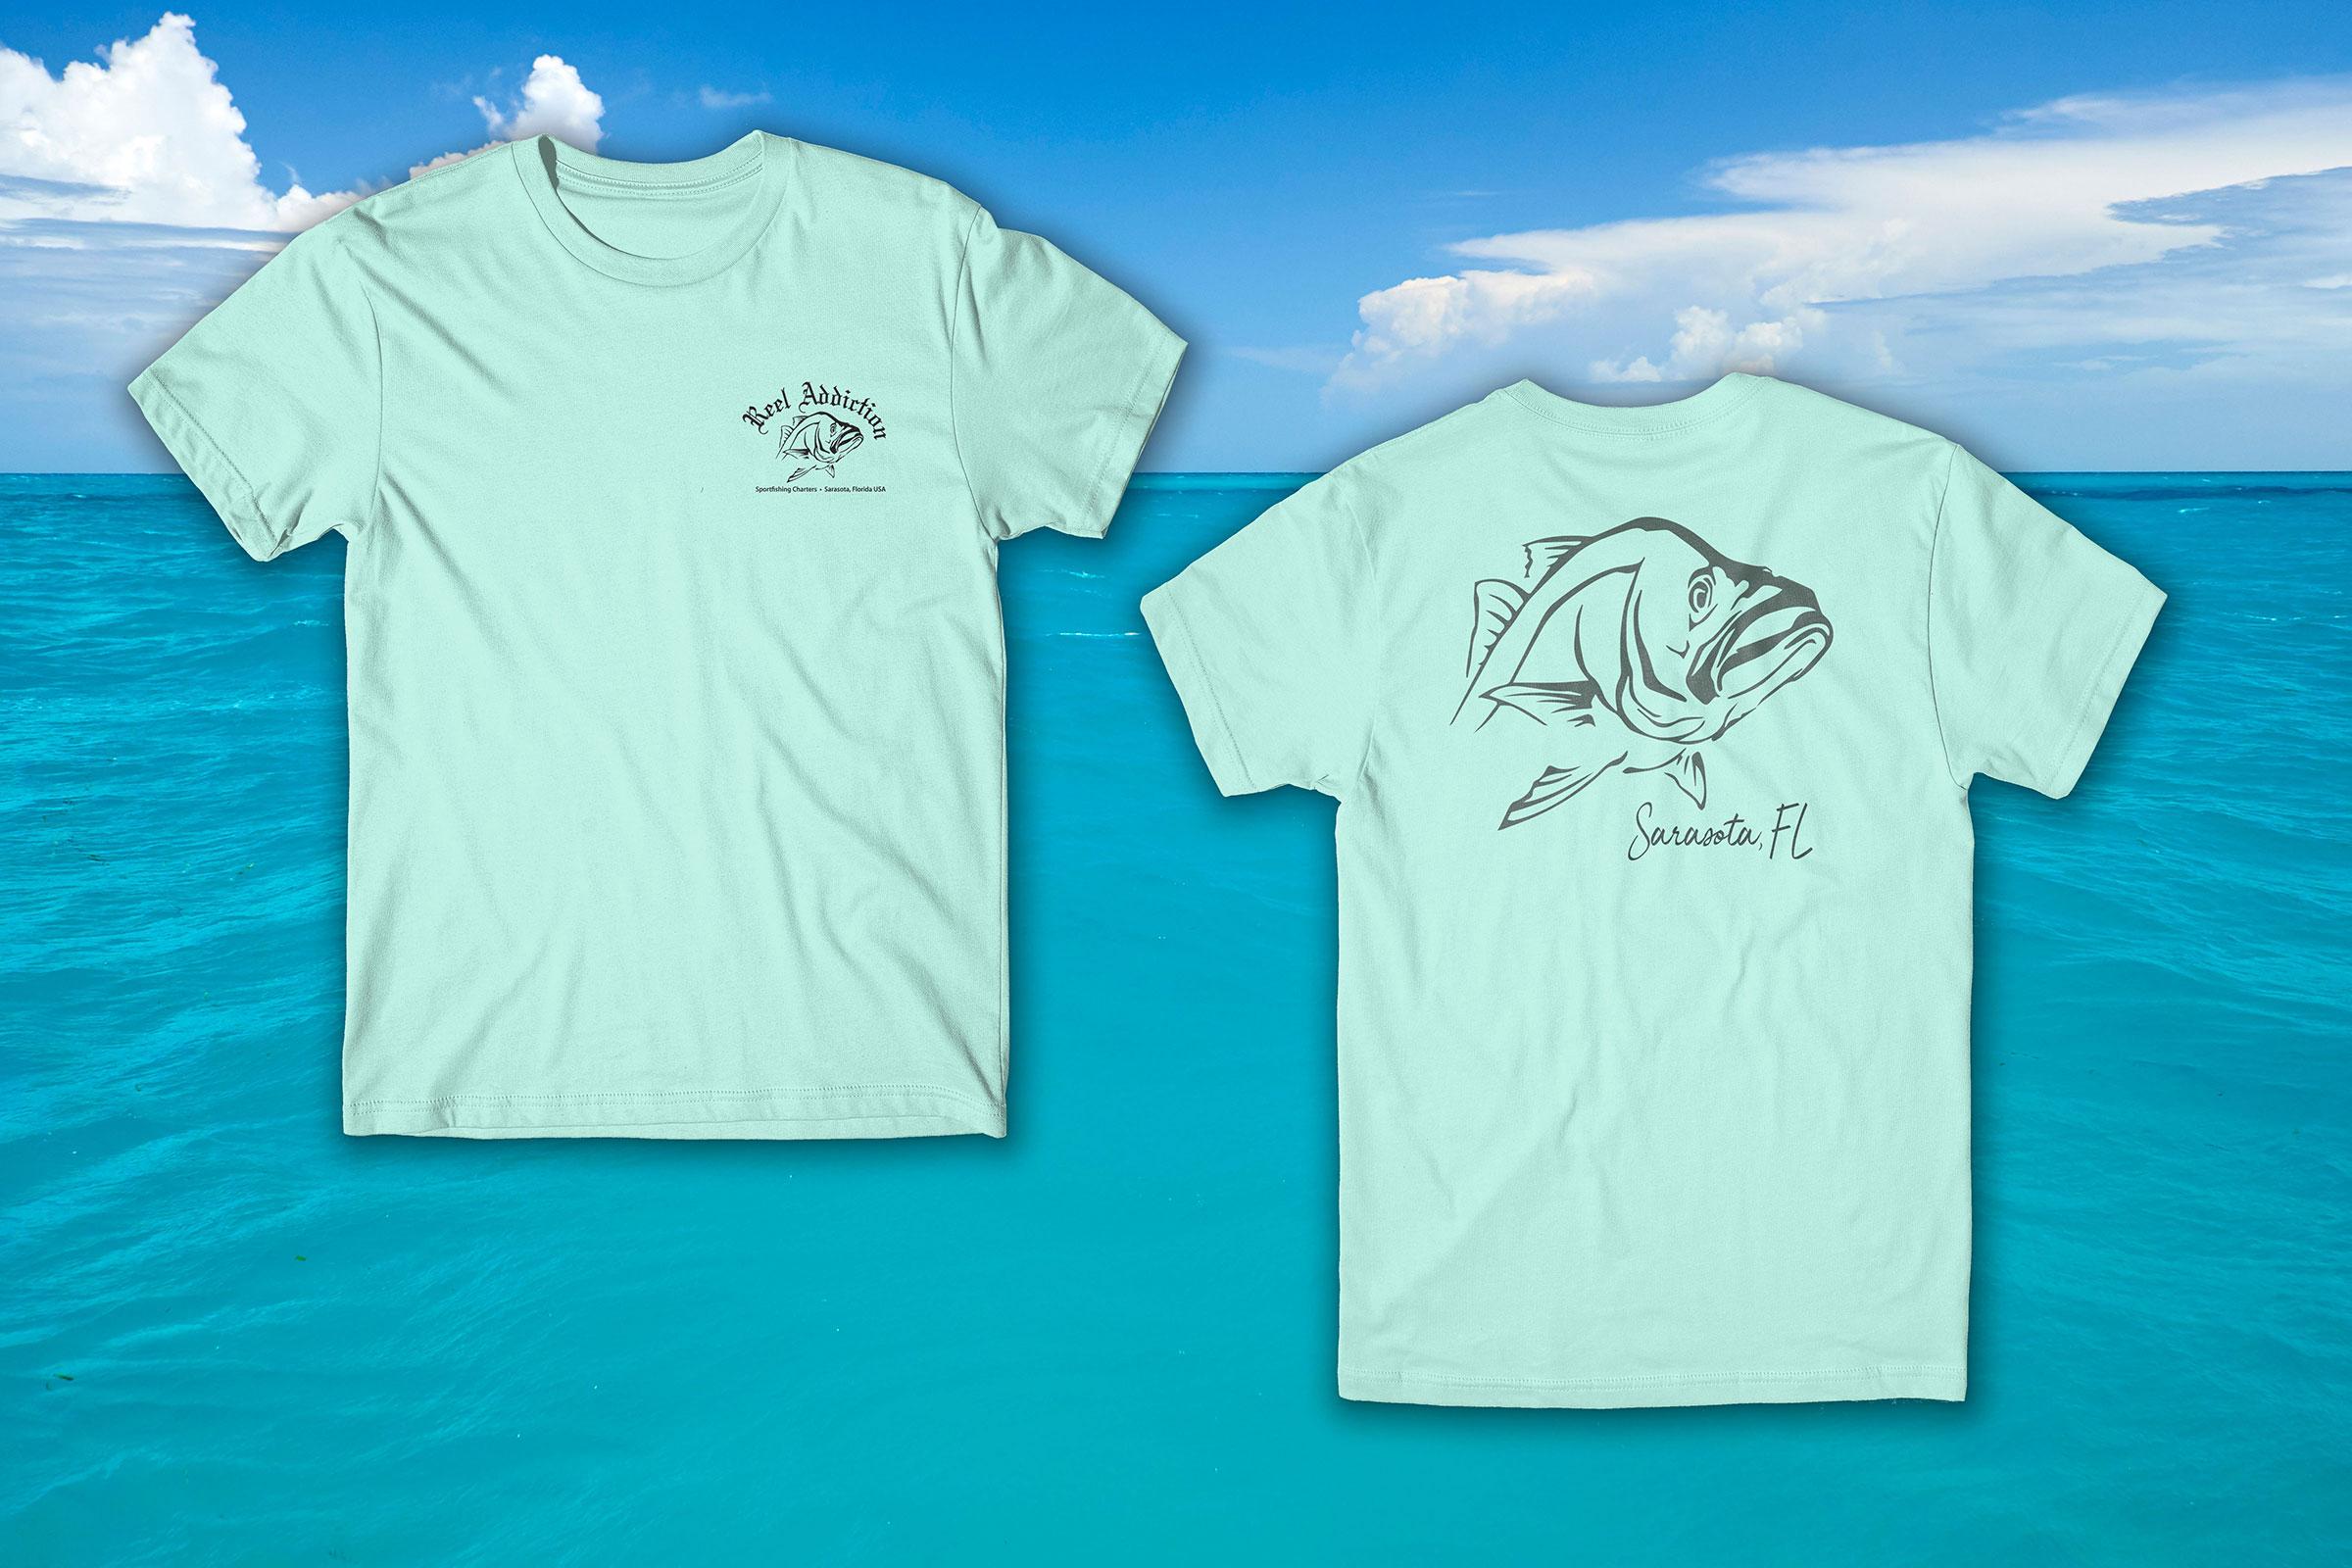 t-shirt and apparel design